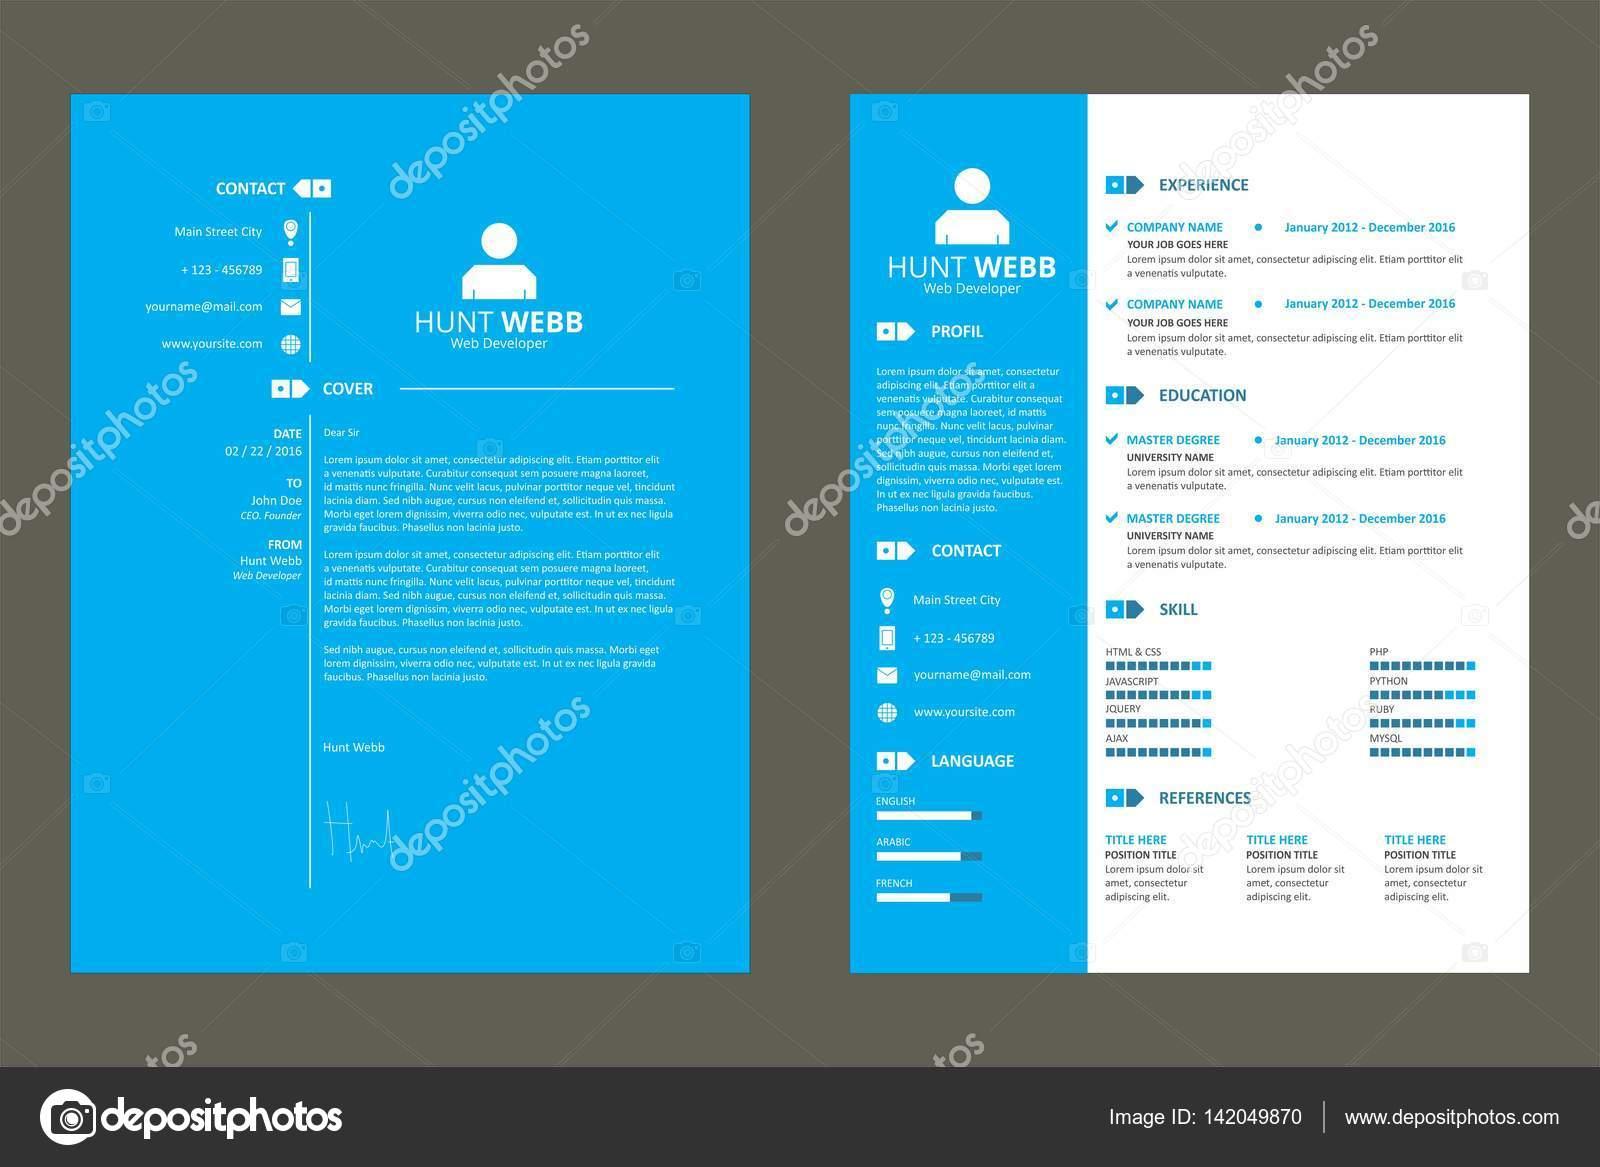 curriculum vitae cv bleu template vecteur  u2014 image